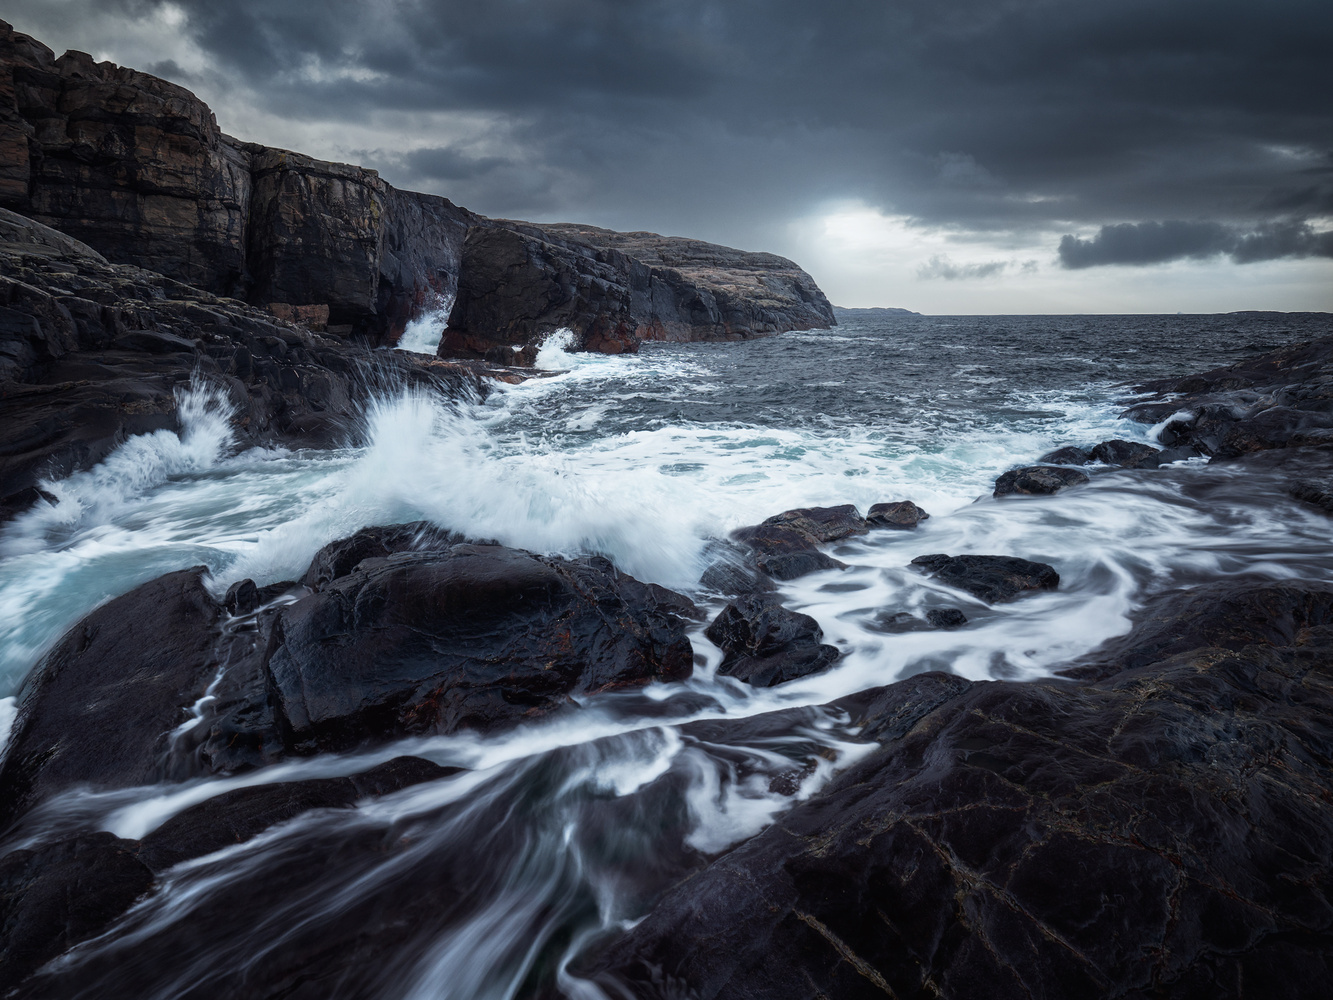 Moody days, moody waves by Rudi Sørstrønen